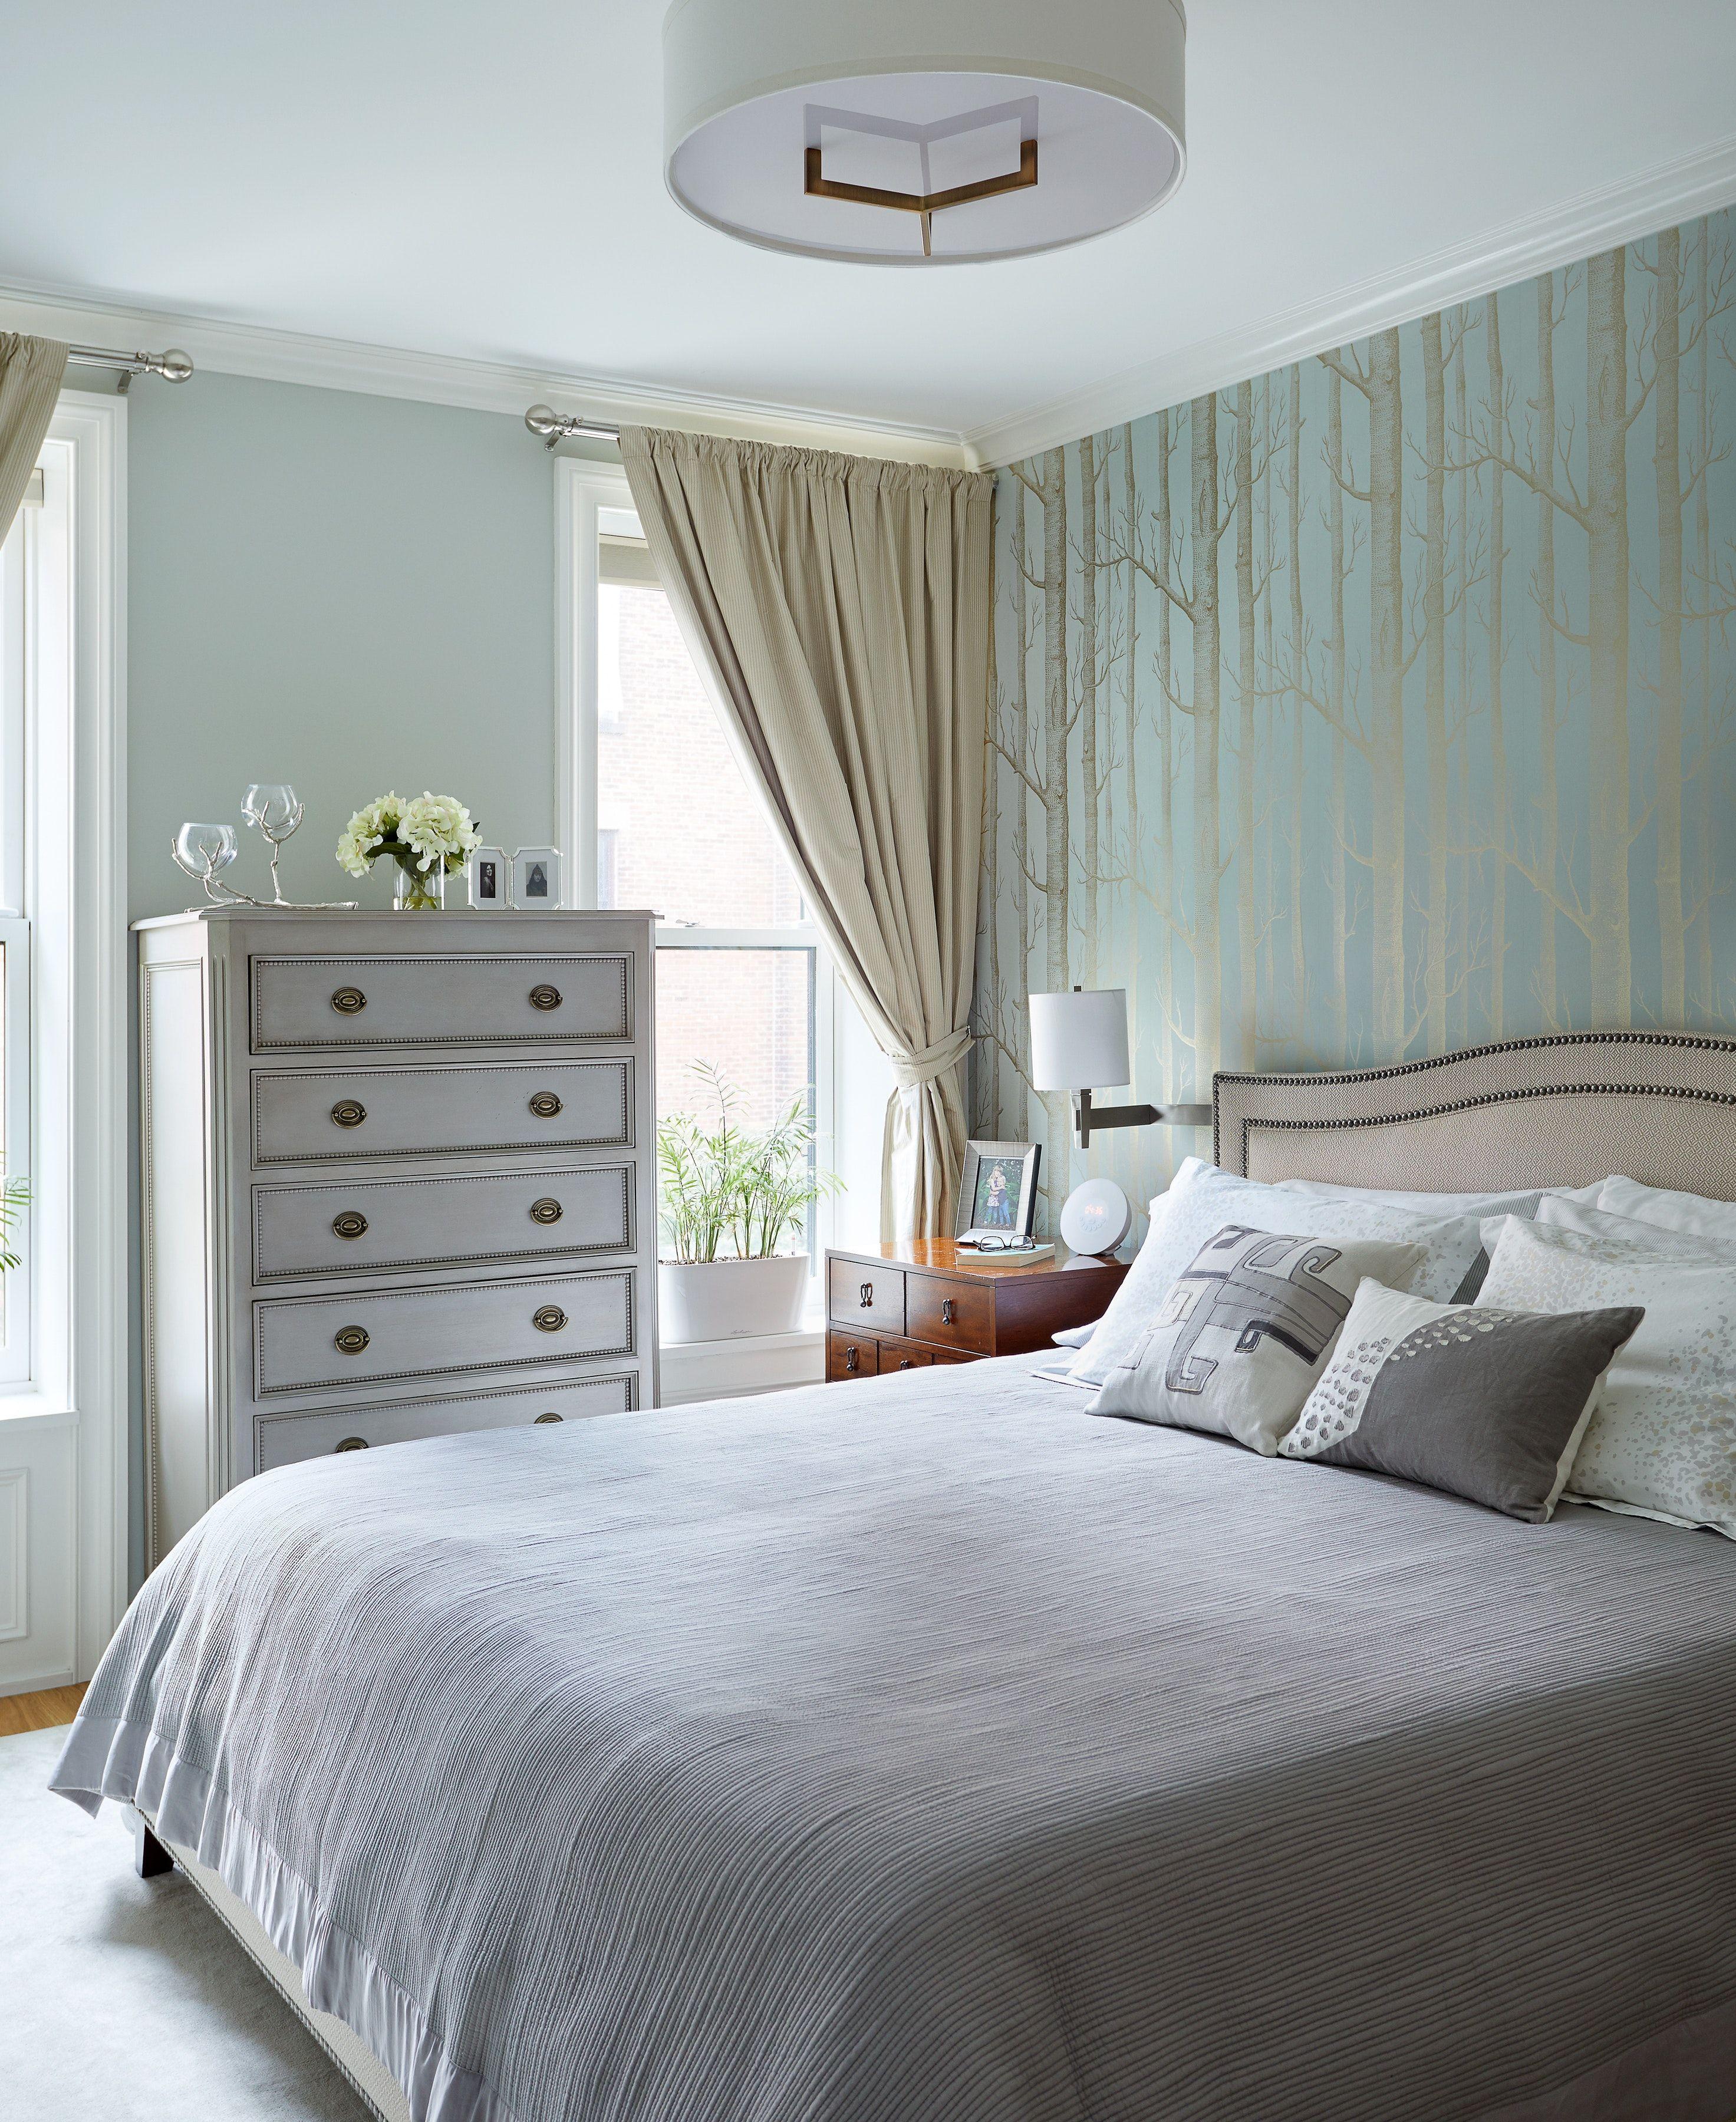 master bedroom in neutral tones with woods wallpaper